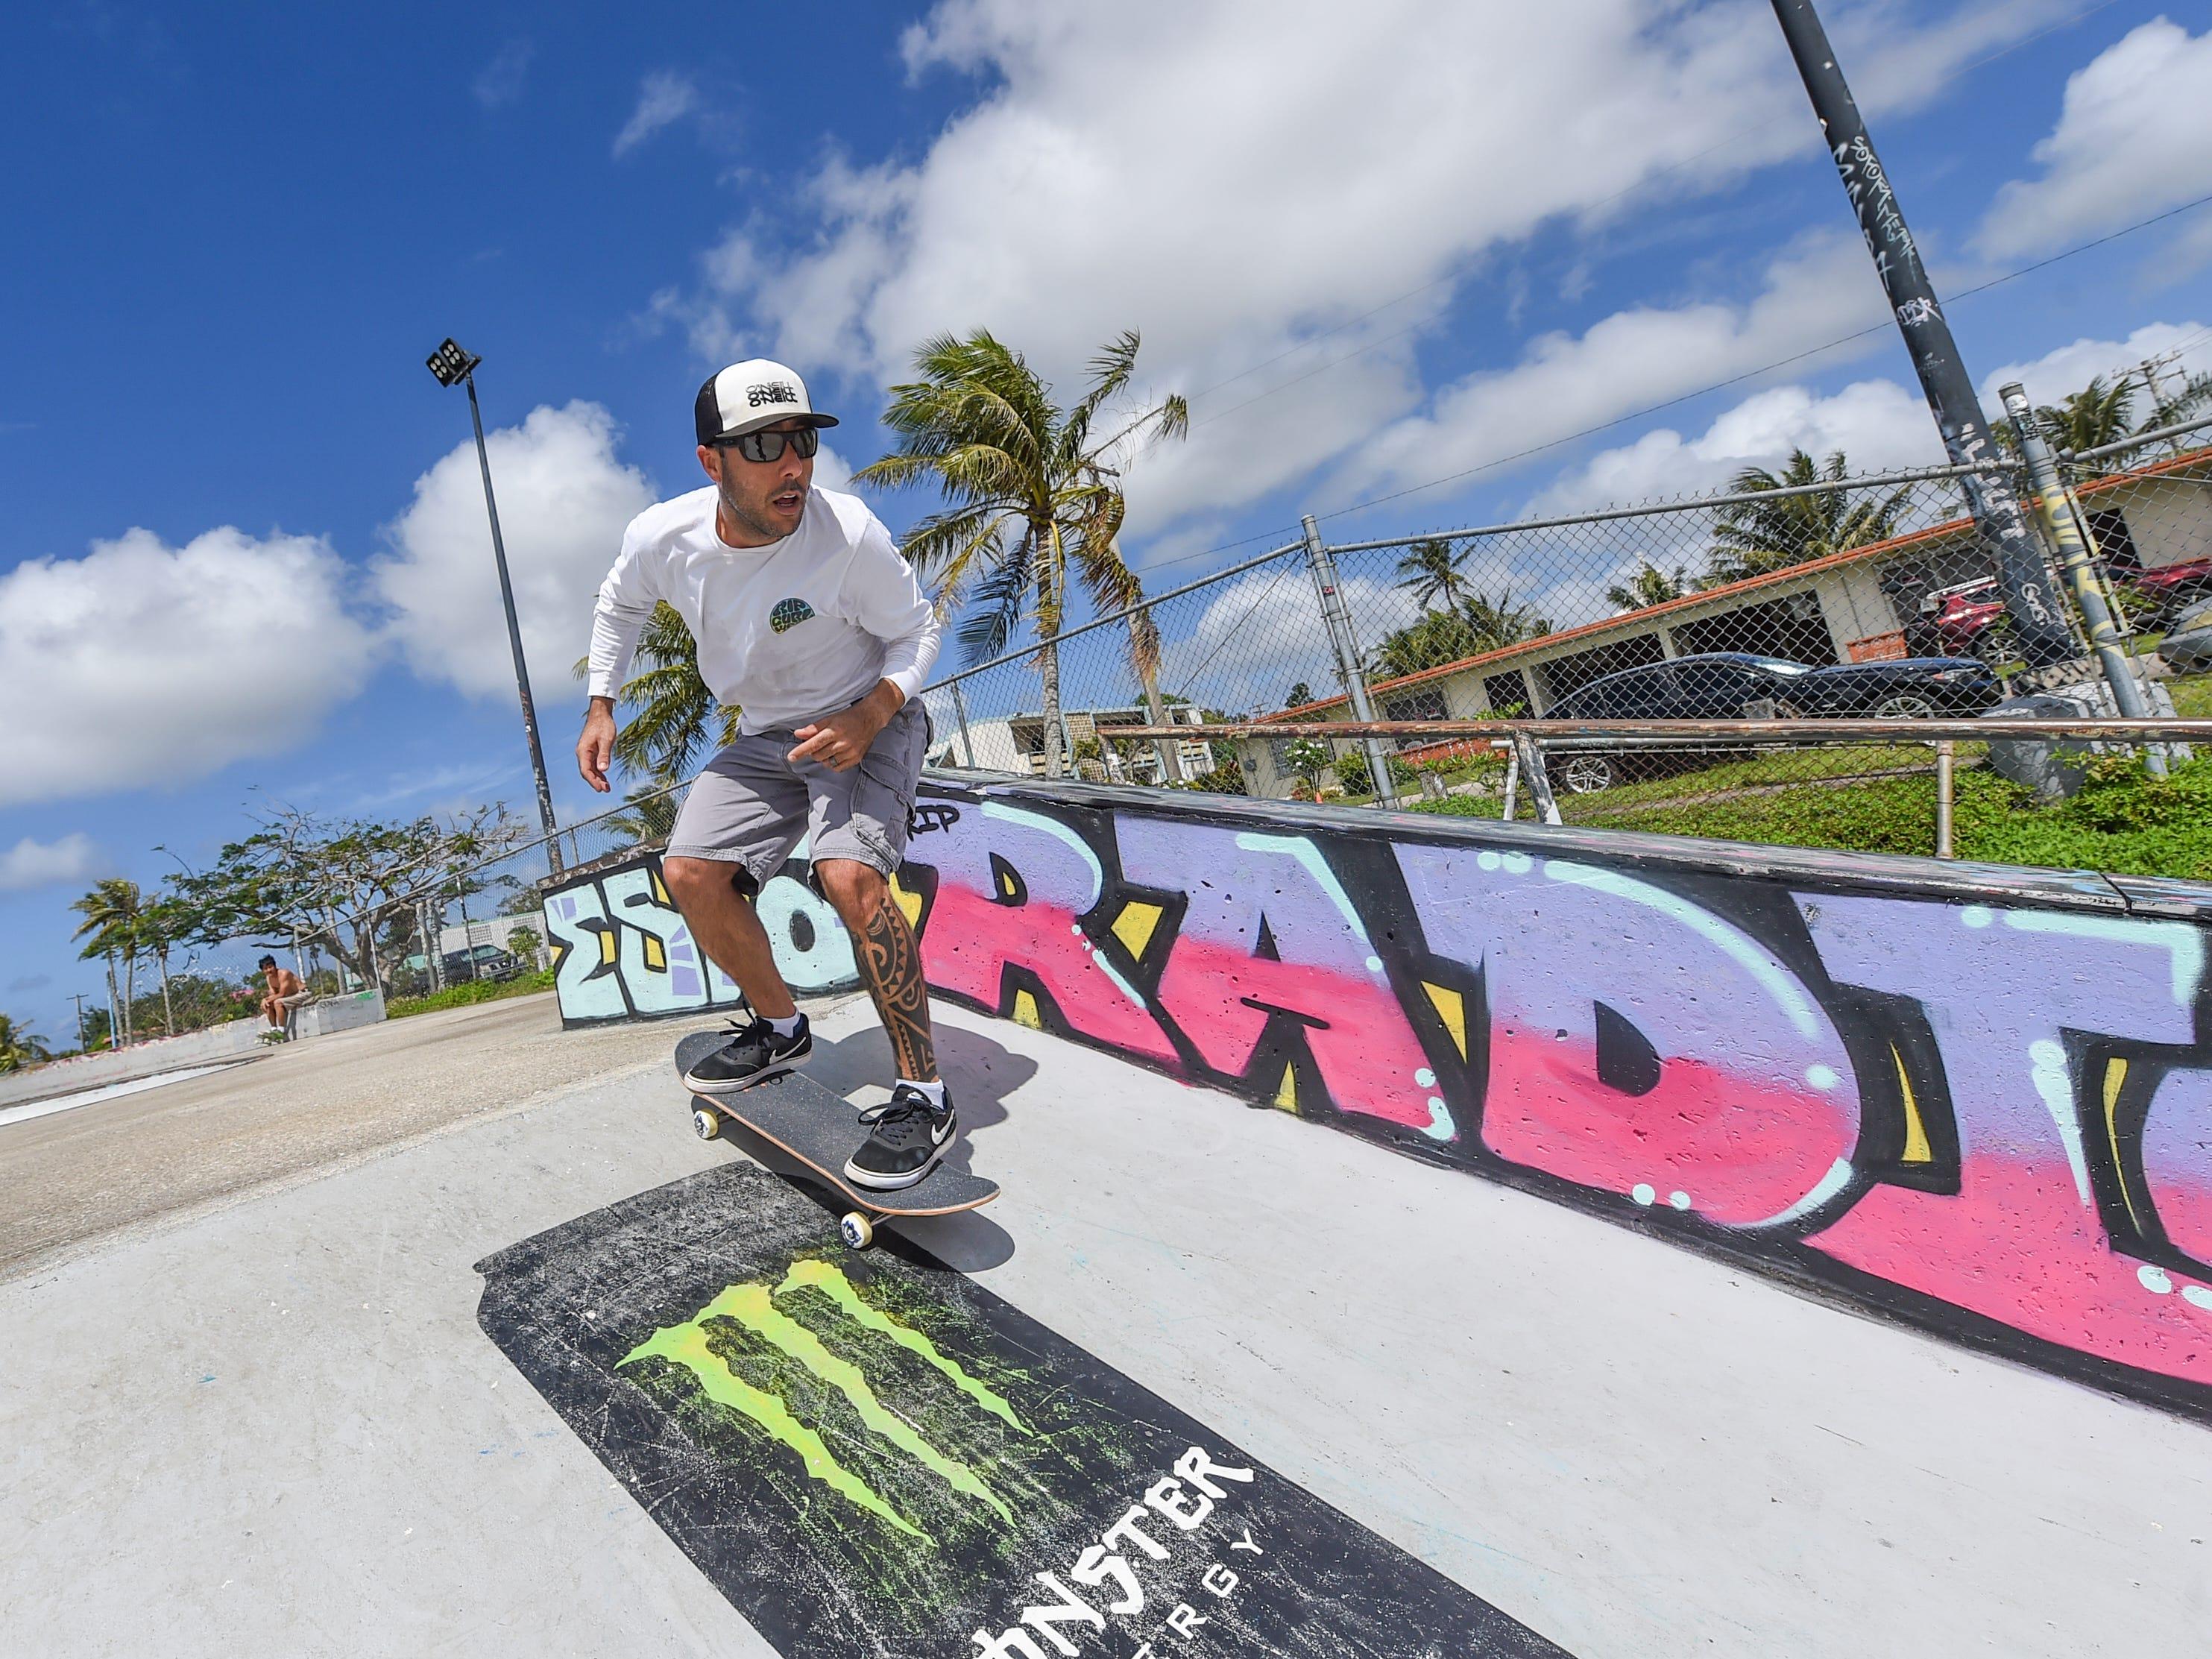 Vinnie Rodrigues skates at the Dededo Skatepark on Feb. 3, 2019.